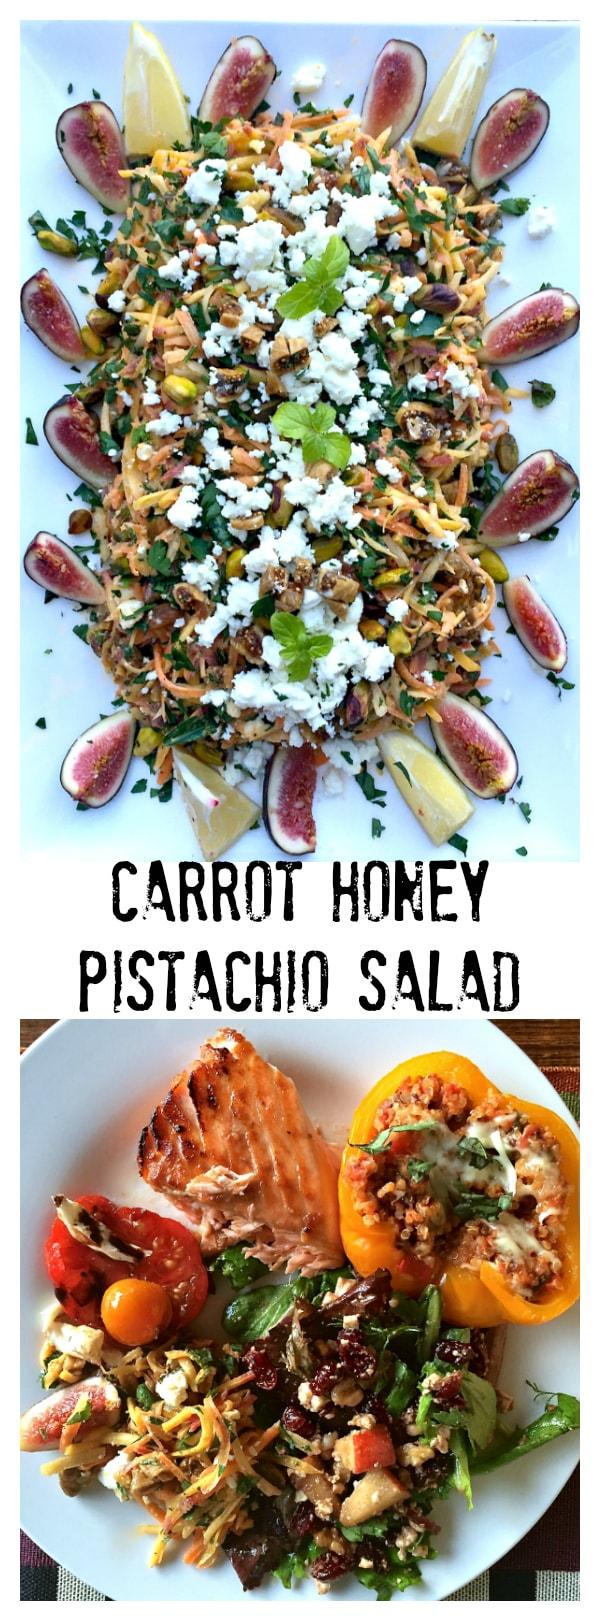 Carrot Honey Pistachio Salad